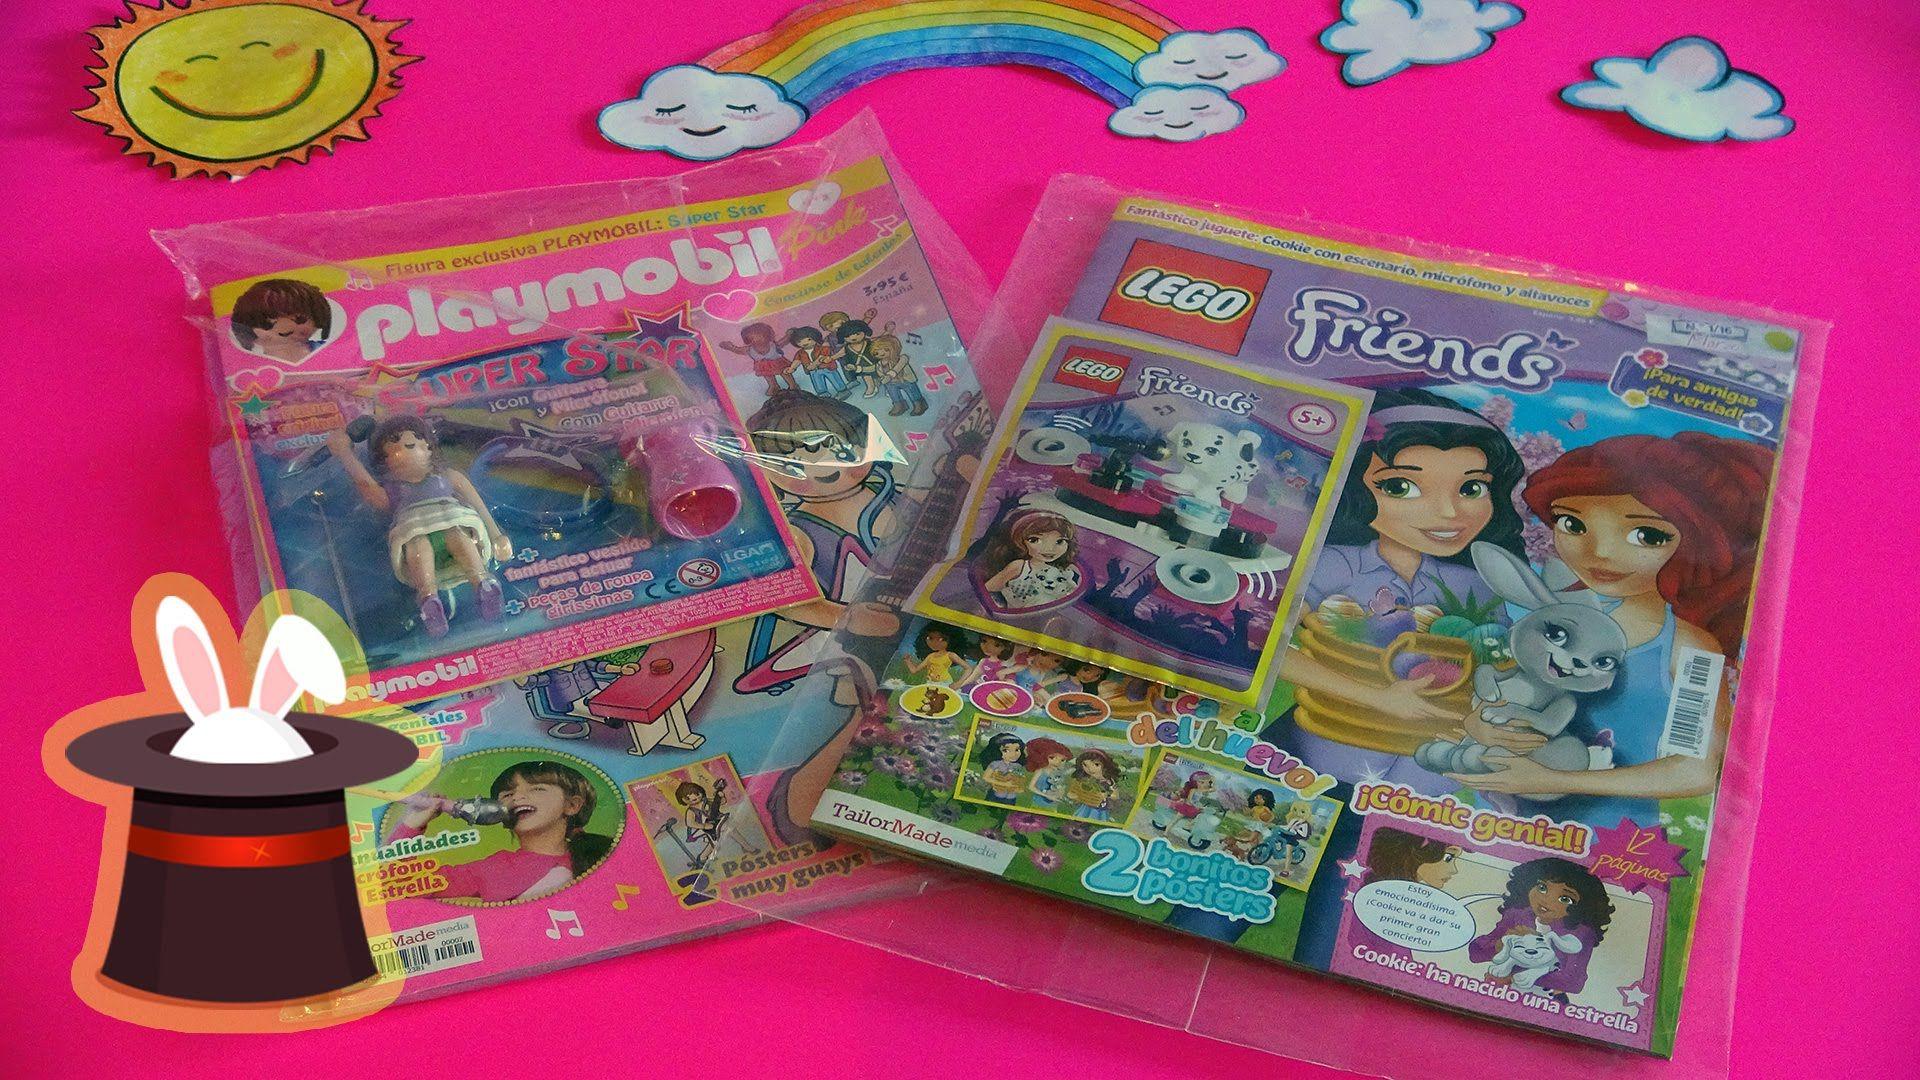 Unboxing Y De Revistas FriendsJuguetes Playmobil Lego Pink f7v6ybgY